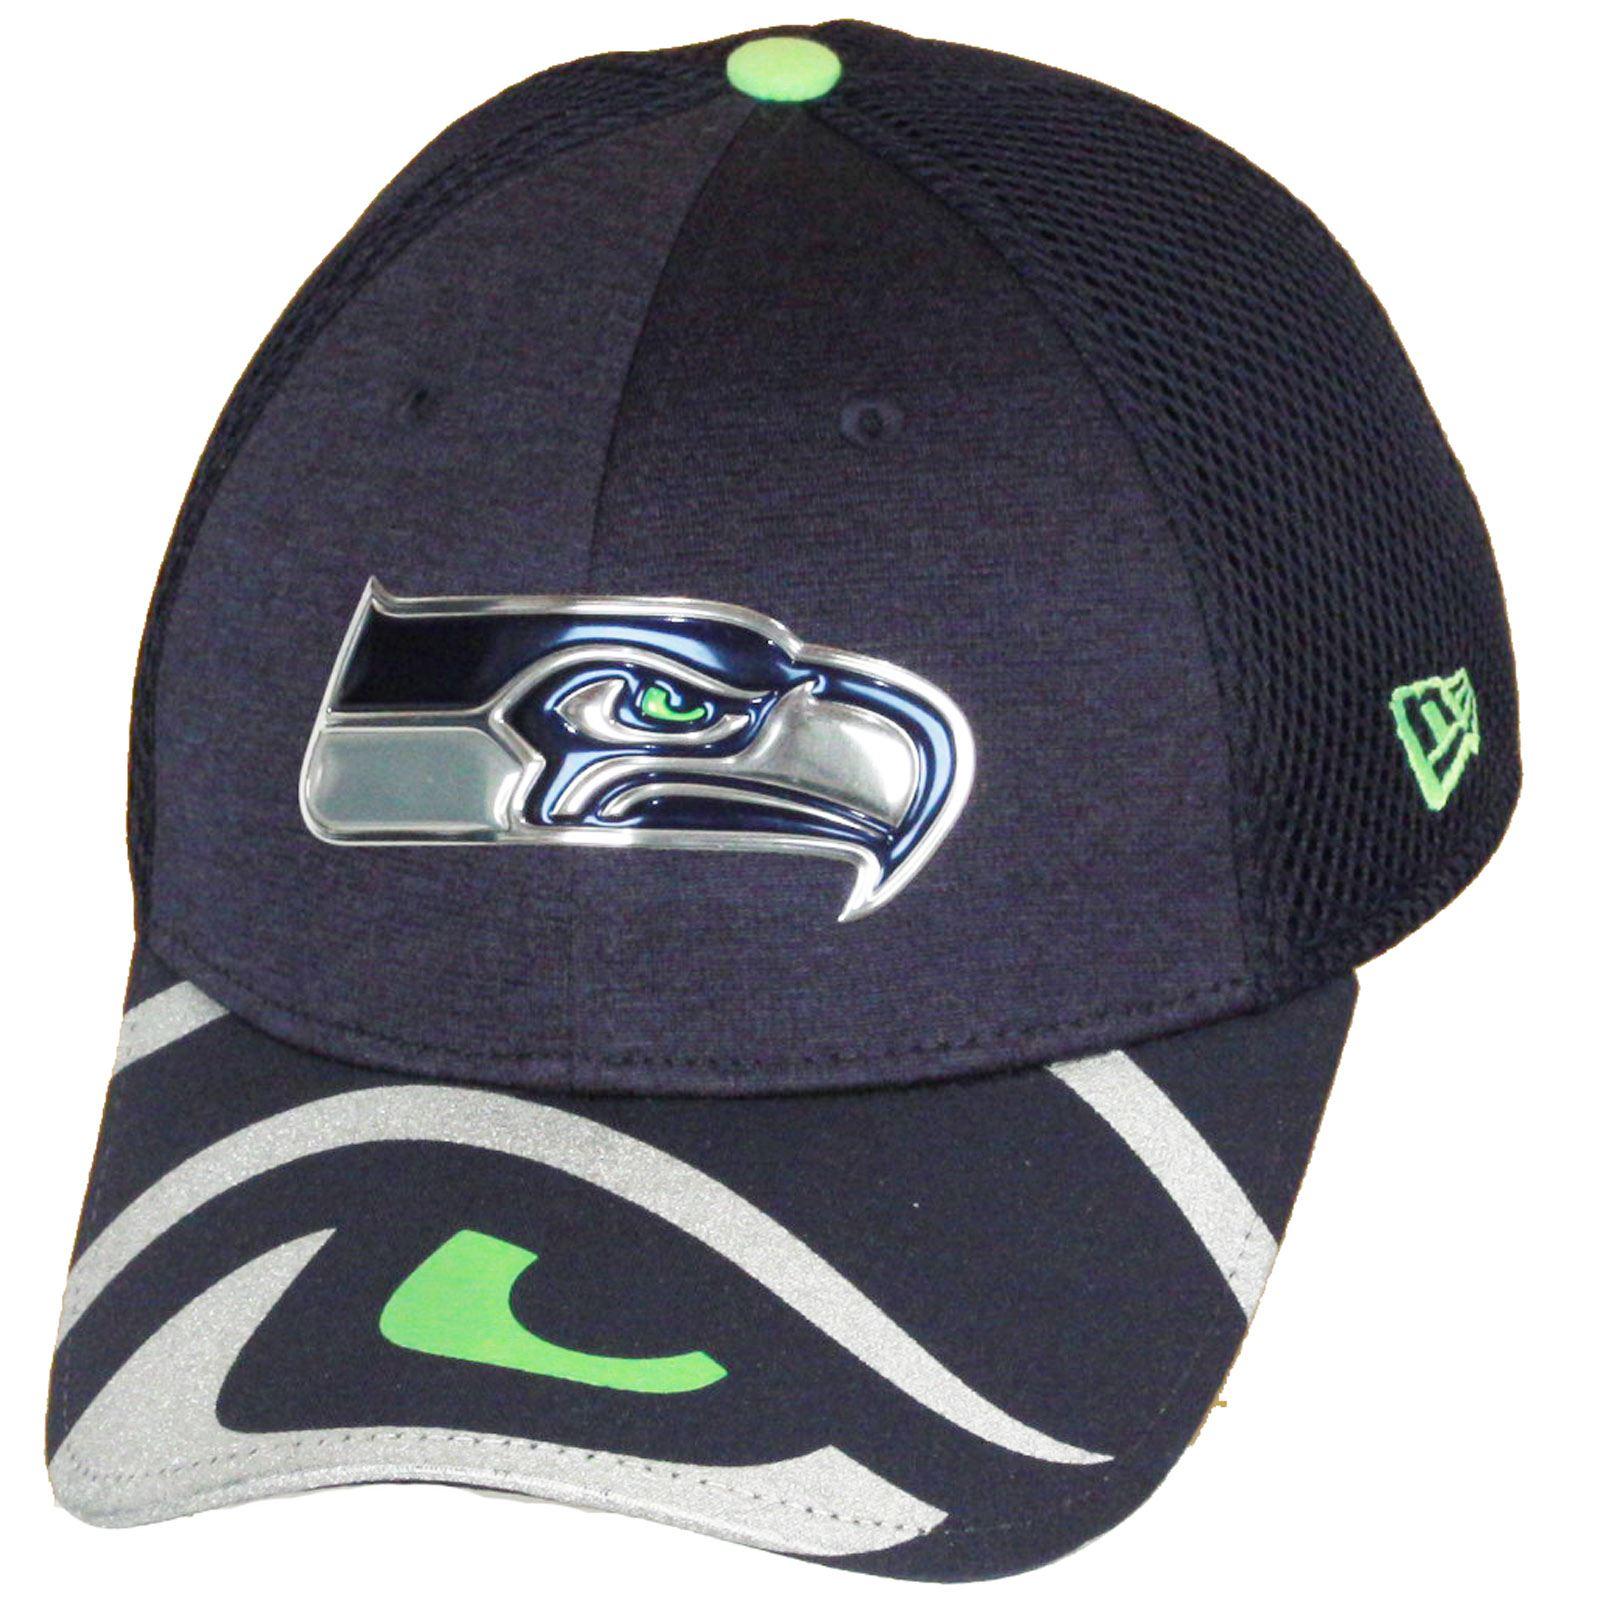 new concept 09702 2041e Era 3930 Seattle Seahawks 2017 NFL Draft on Stage OTC Cap Cap ...